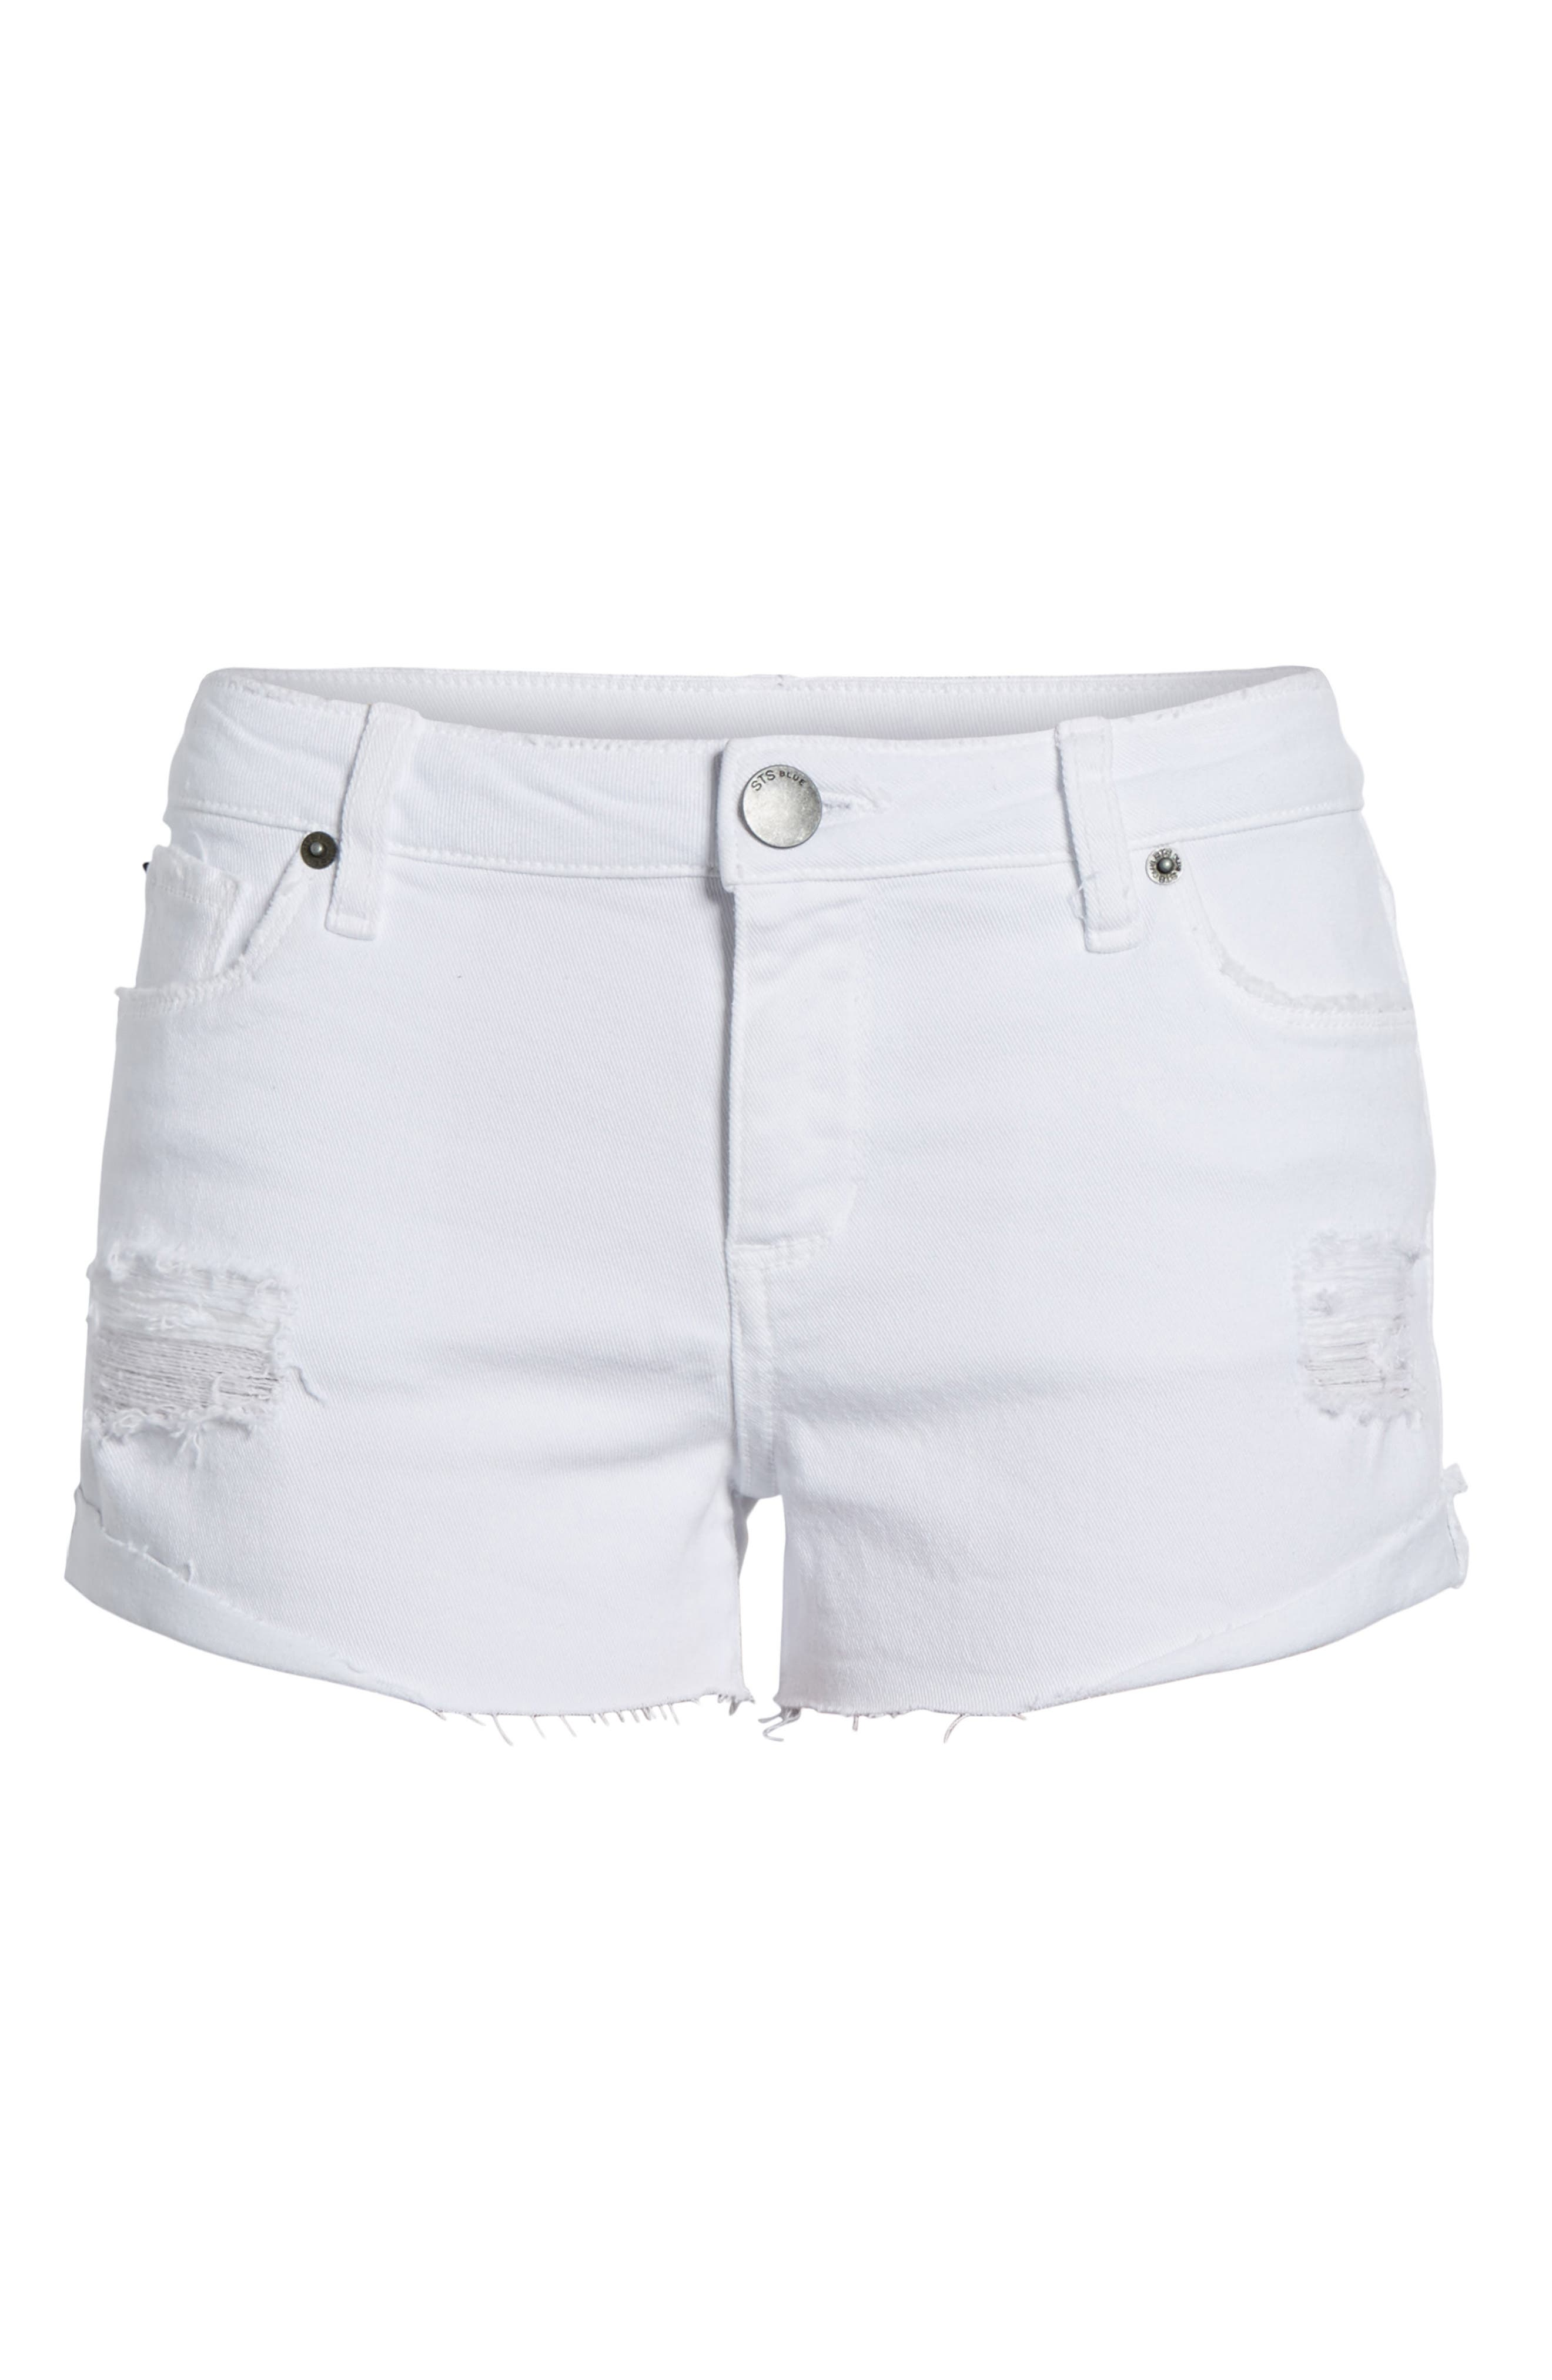 STS BLUE,                             Distressed Boyfriend Denim Shorts,                             Alternate thumbnail 7, color,                             110